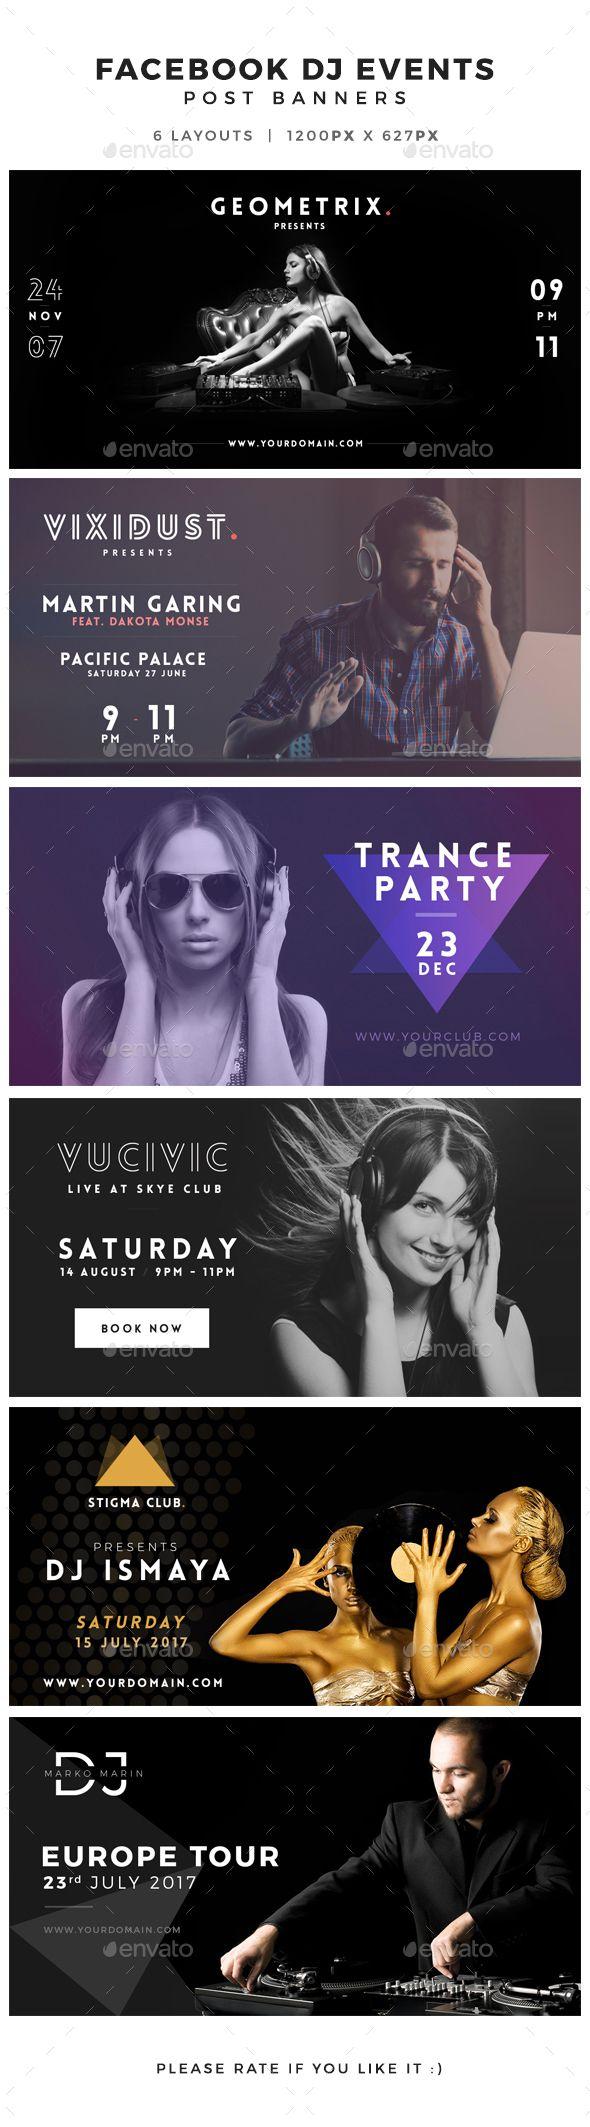 Facebook DJ Events Post Banner — Photoshop PSD #1200x627 #fb • Download ➝ https://graphicriver.net/item/facebook-dj-events-post-banner/14062288?ref=pxcr